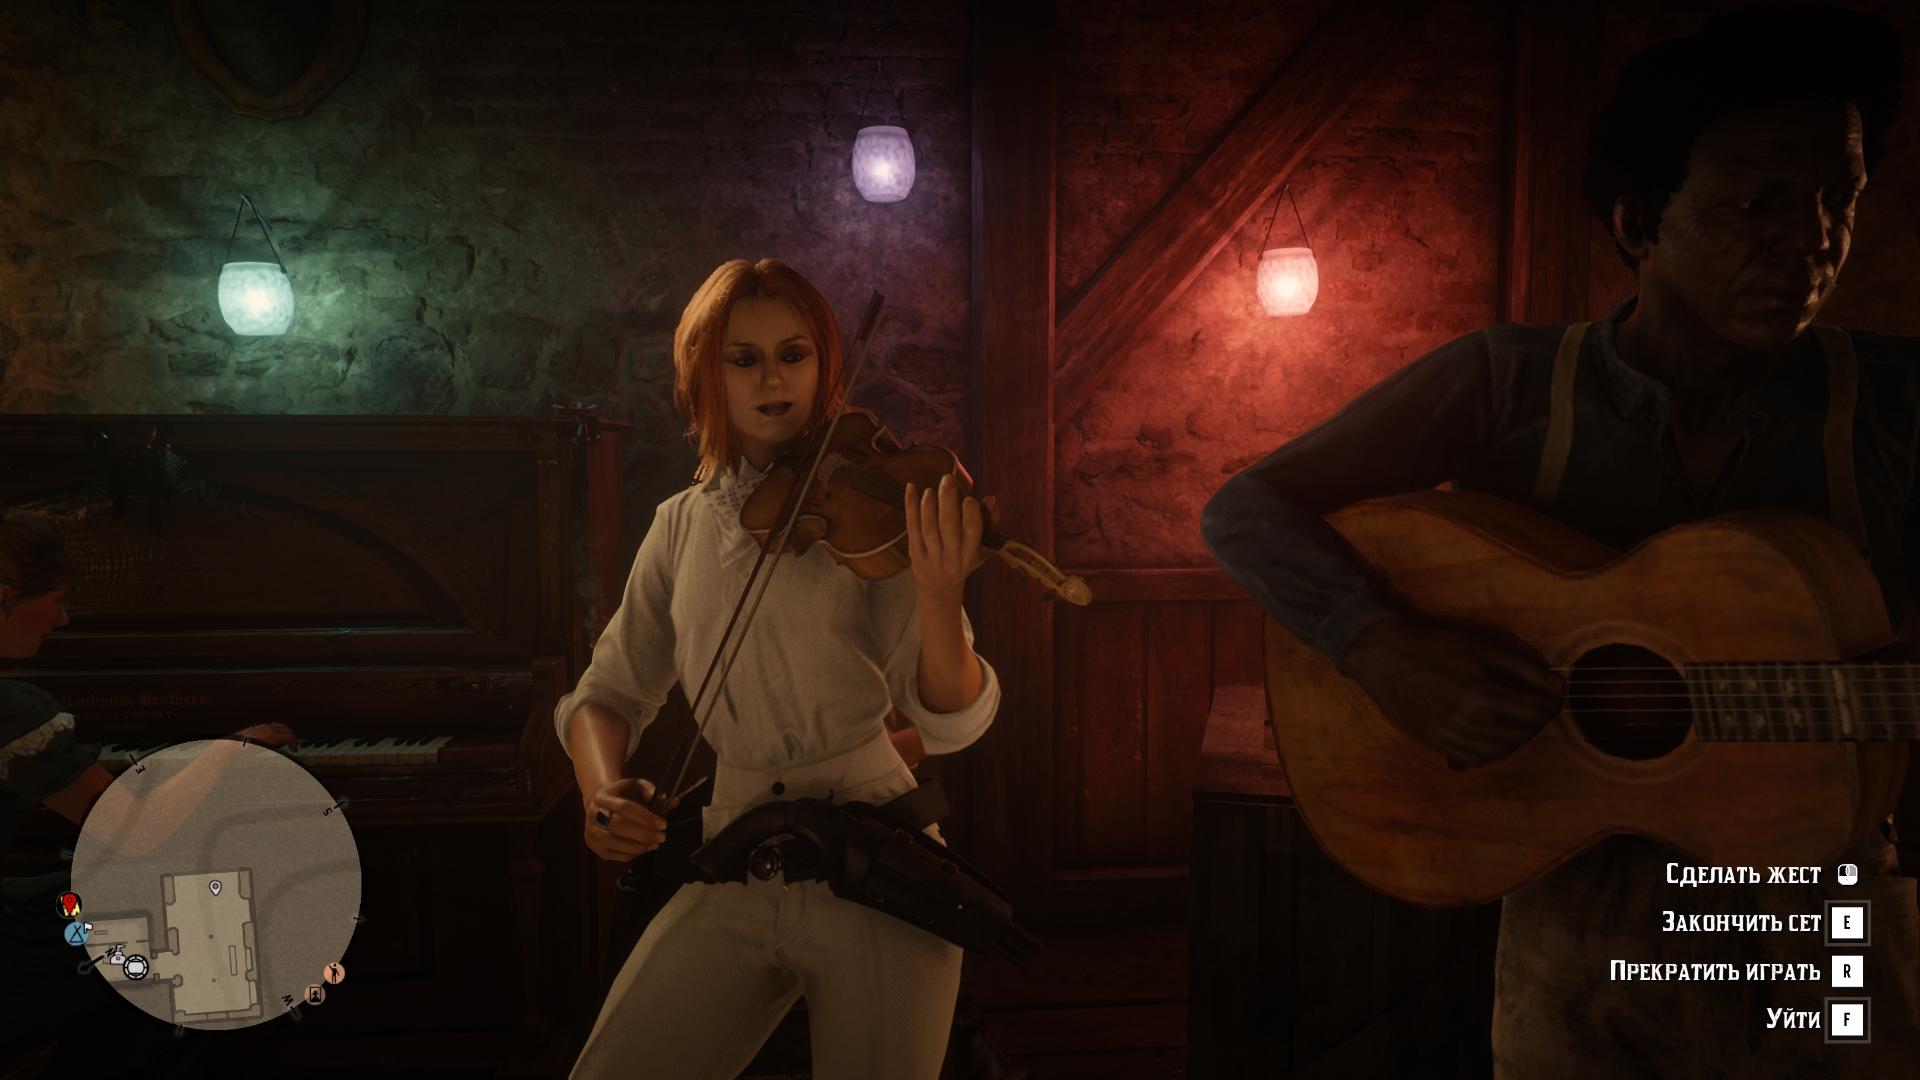 Скрипачка - Red Dead Redemption 2